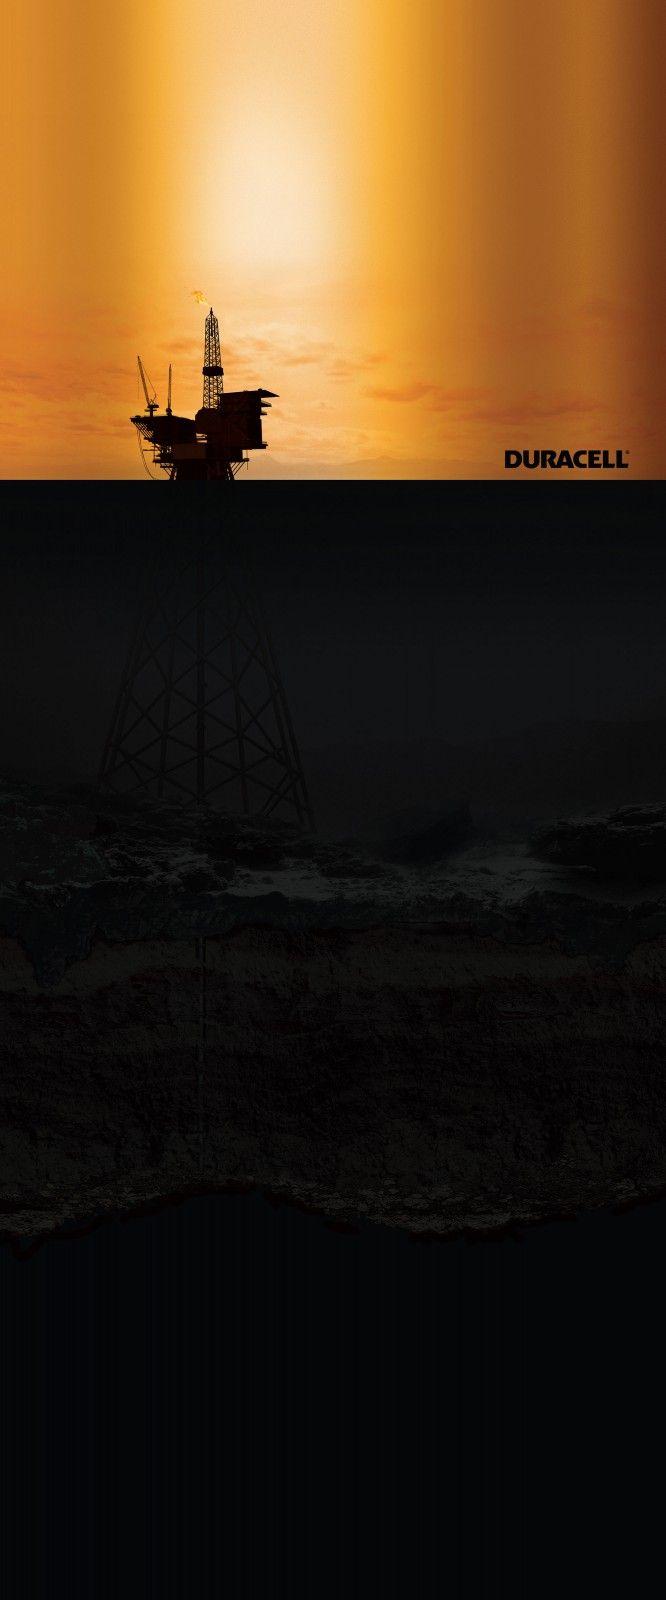 Adeevee - Duracell: Endless Energy